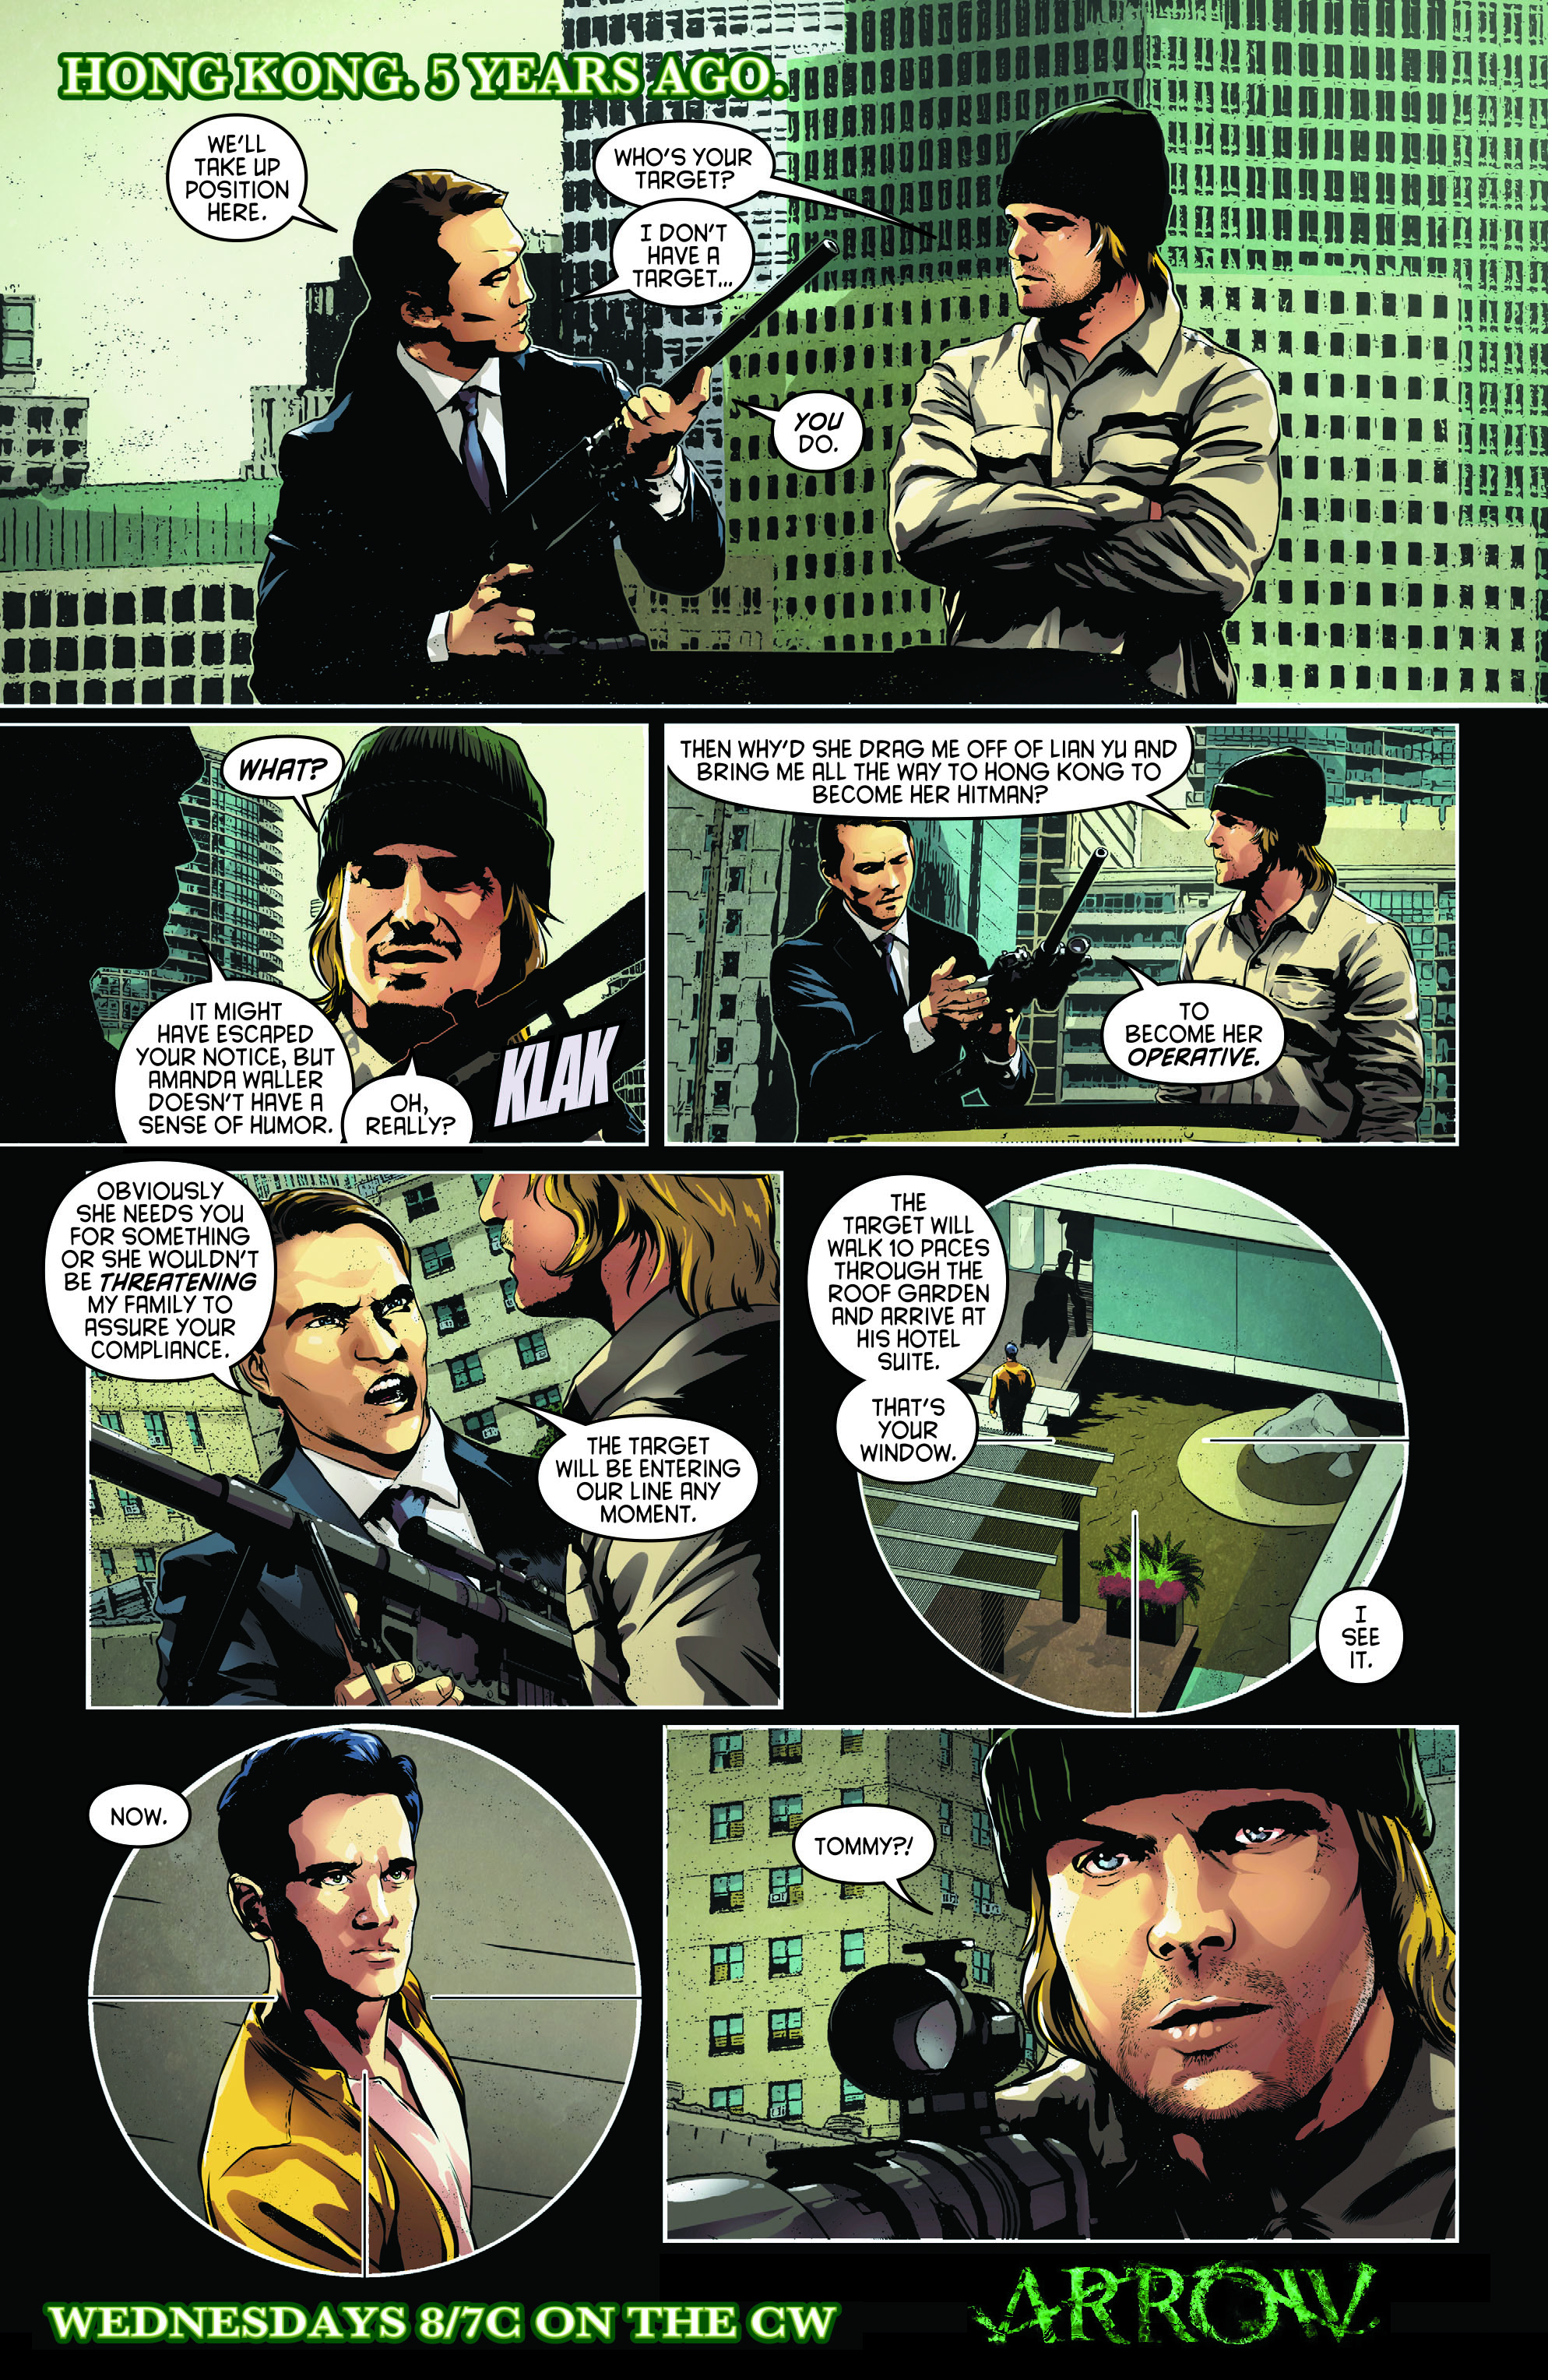 Arrow Ep. 302 - Comic Preview.jpg